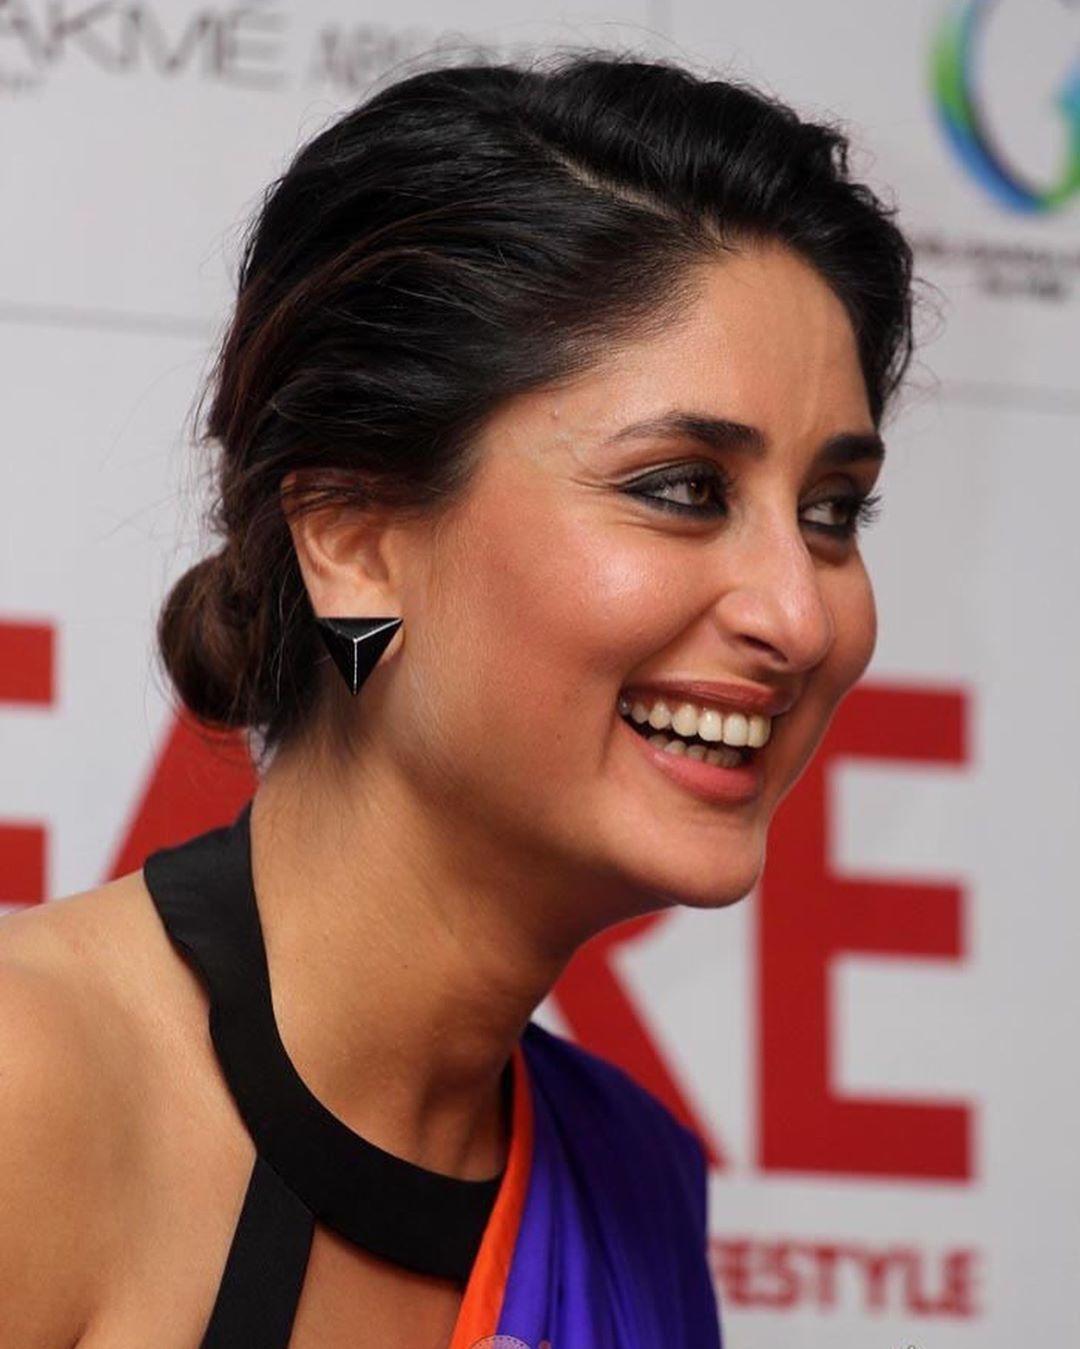 Good Morning With Her Smile ️😍 ️   Kareena kapoor khan ...